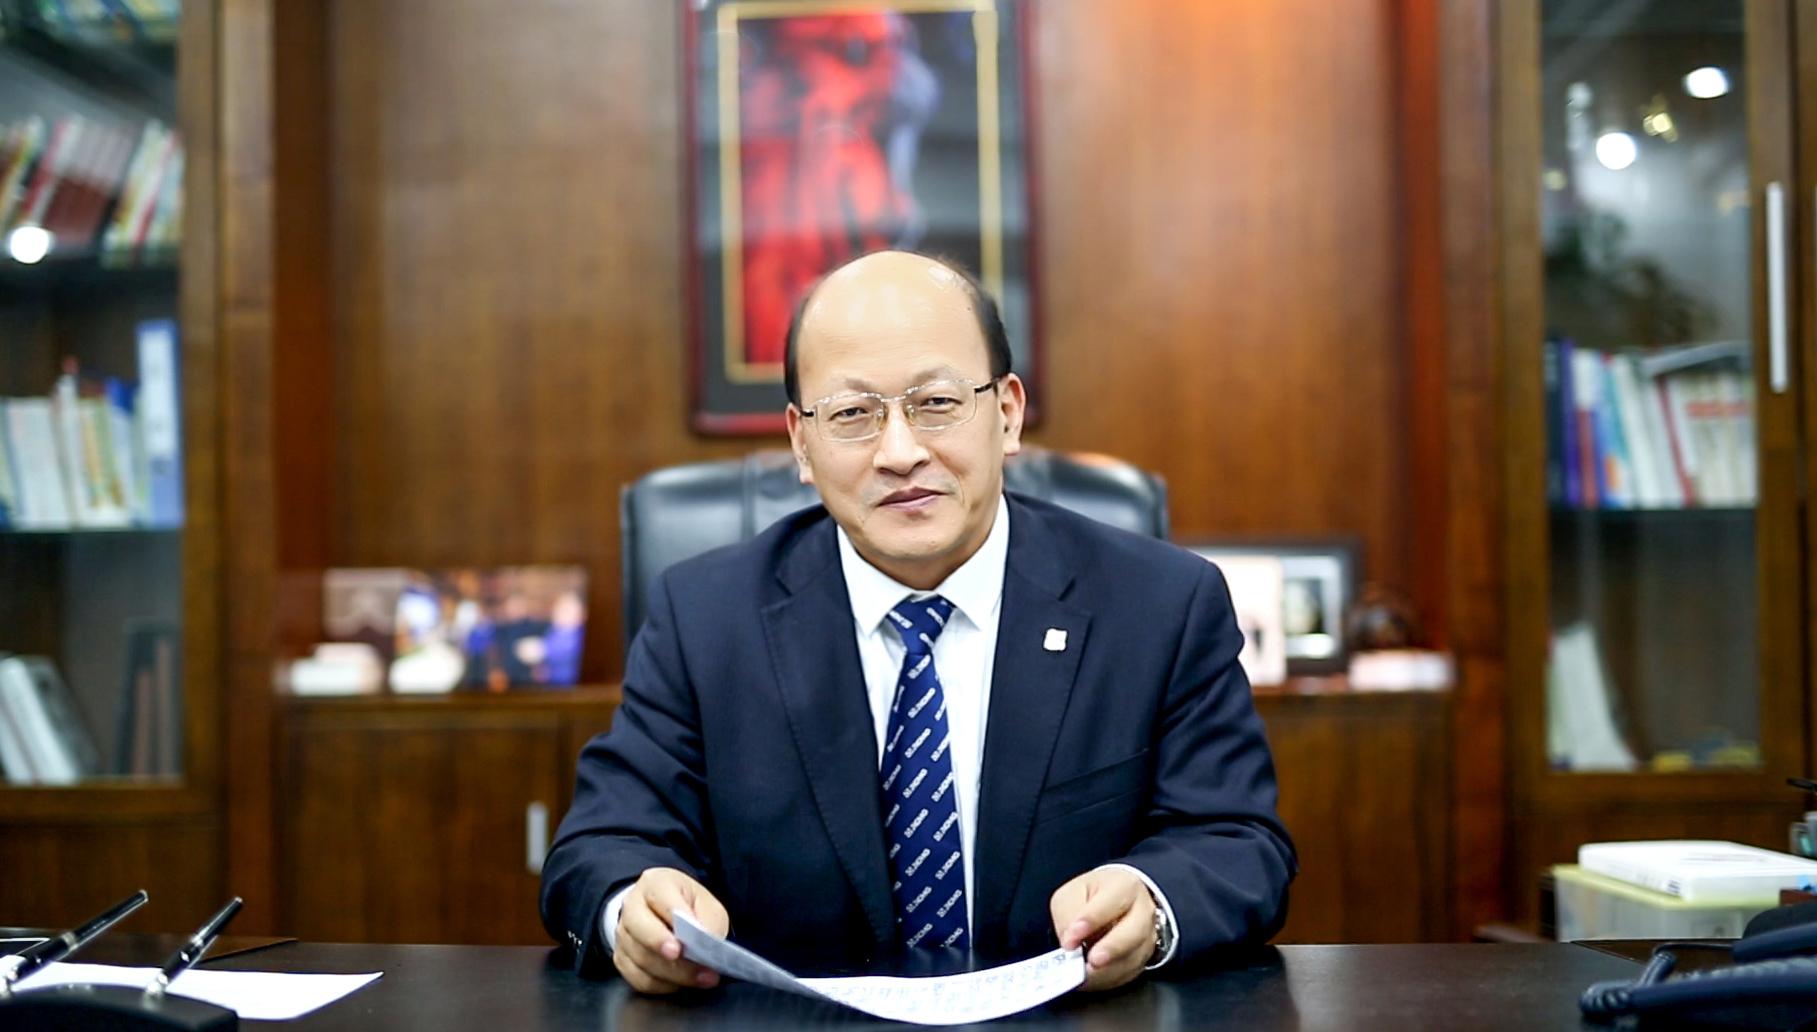 businessman image